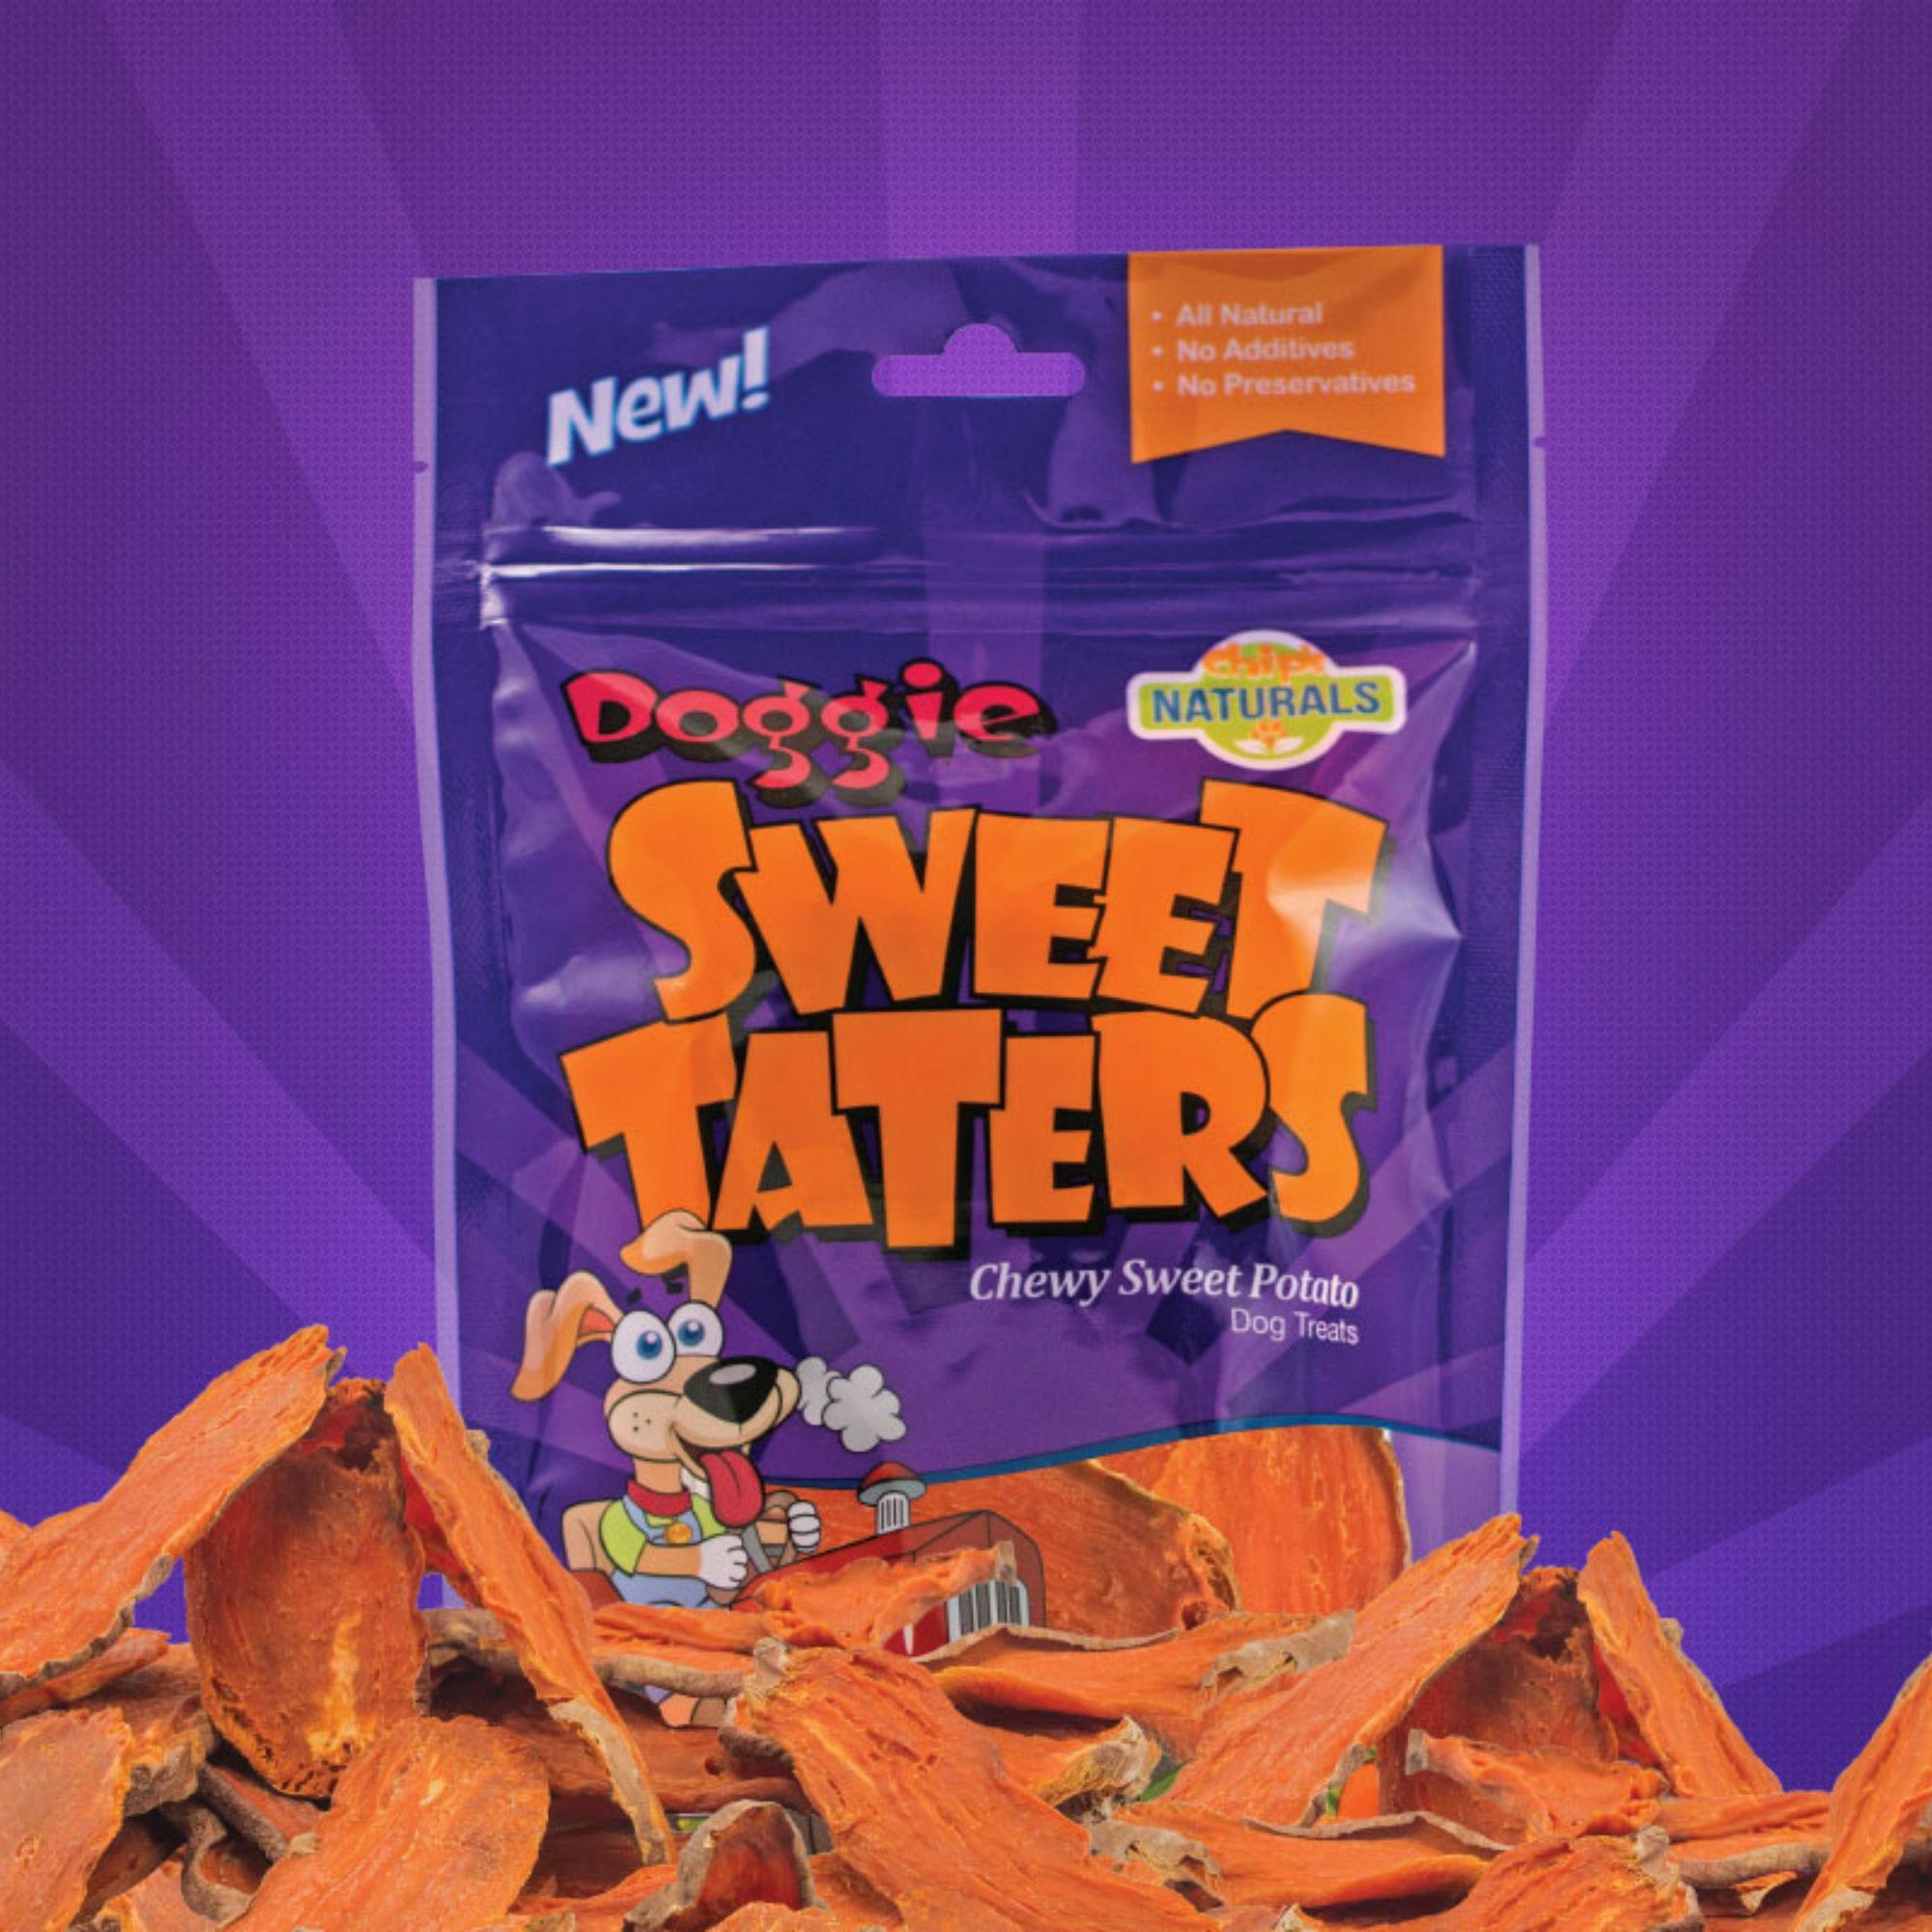 Doggie Sweet Taters Dog Treats